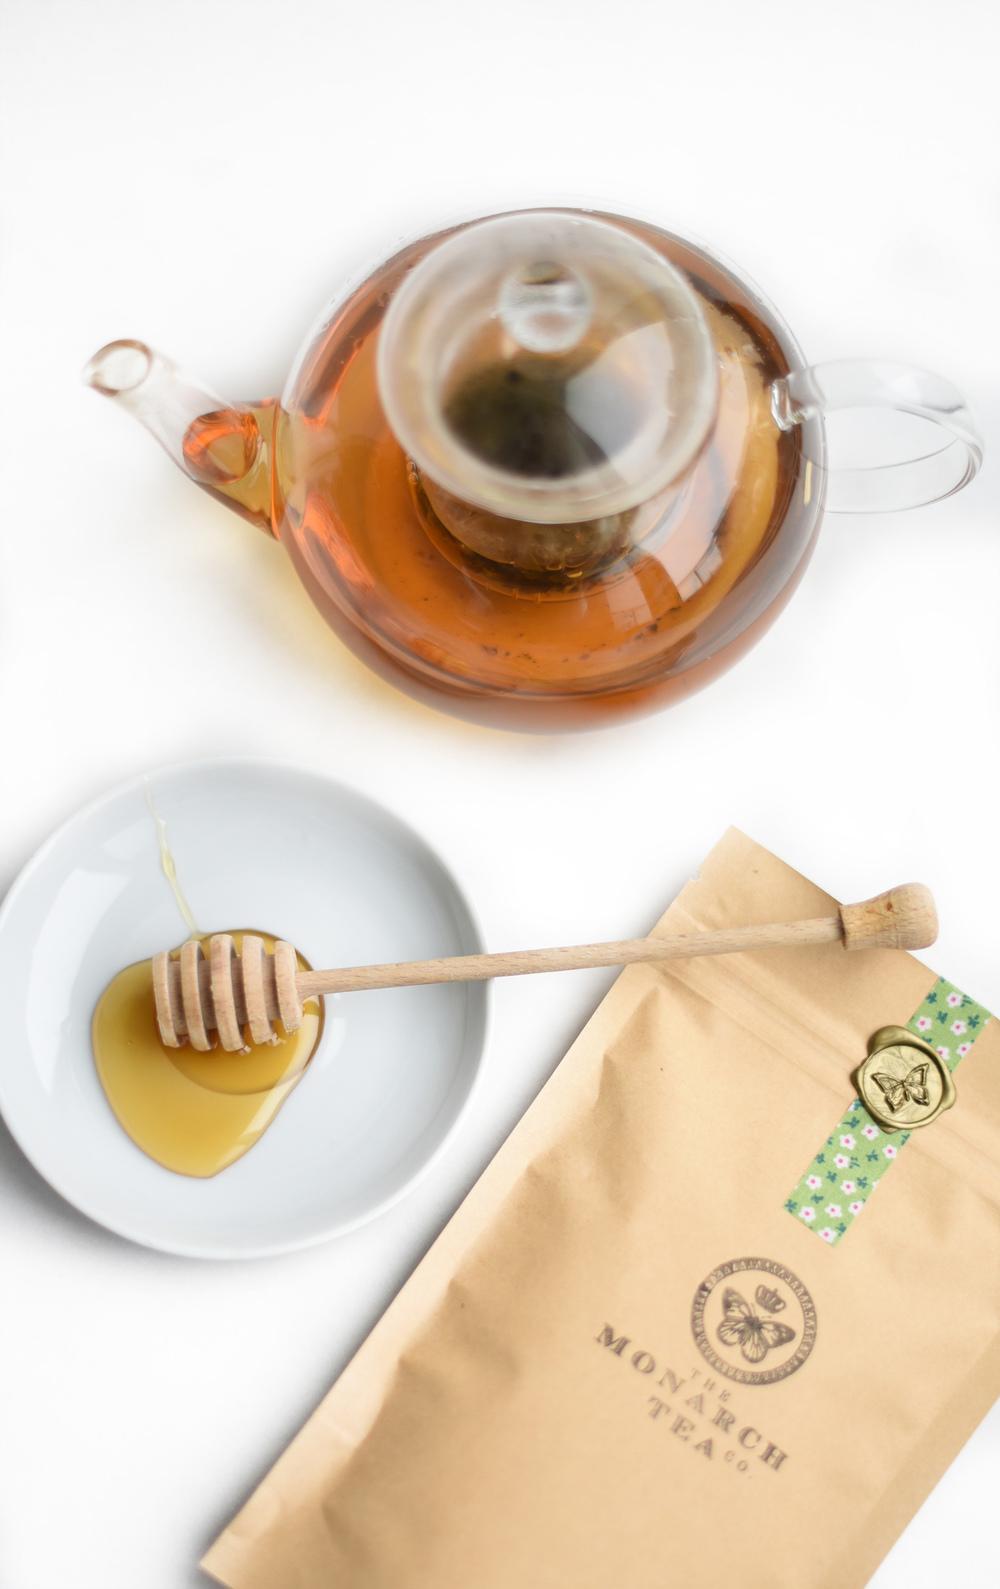 The Monarch Tea Co.